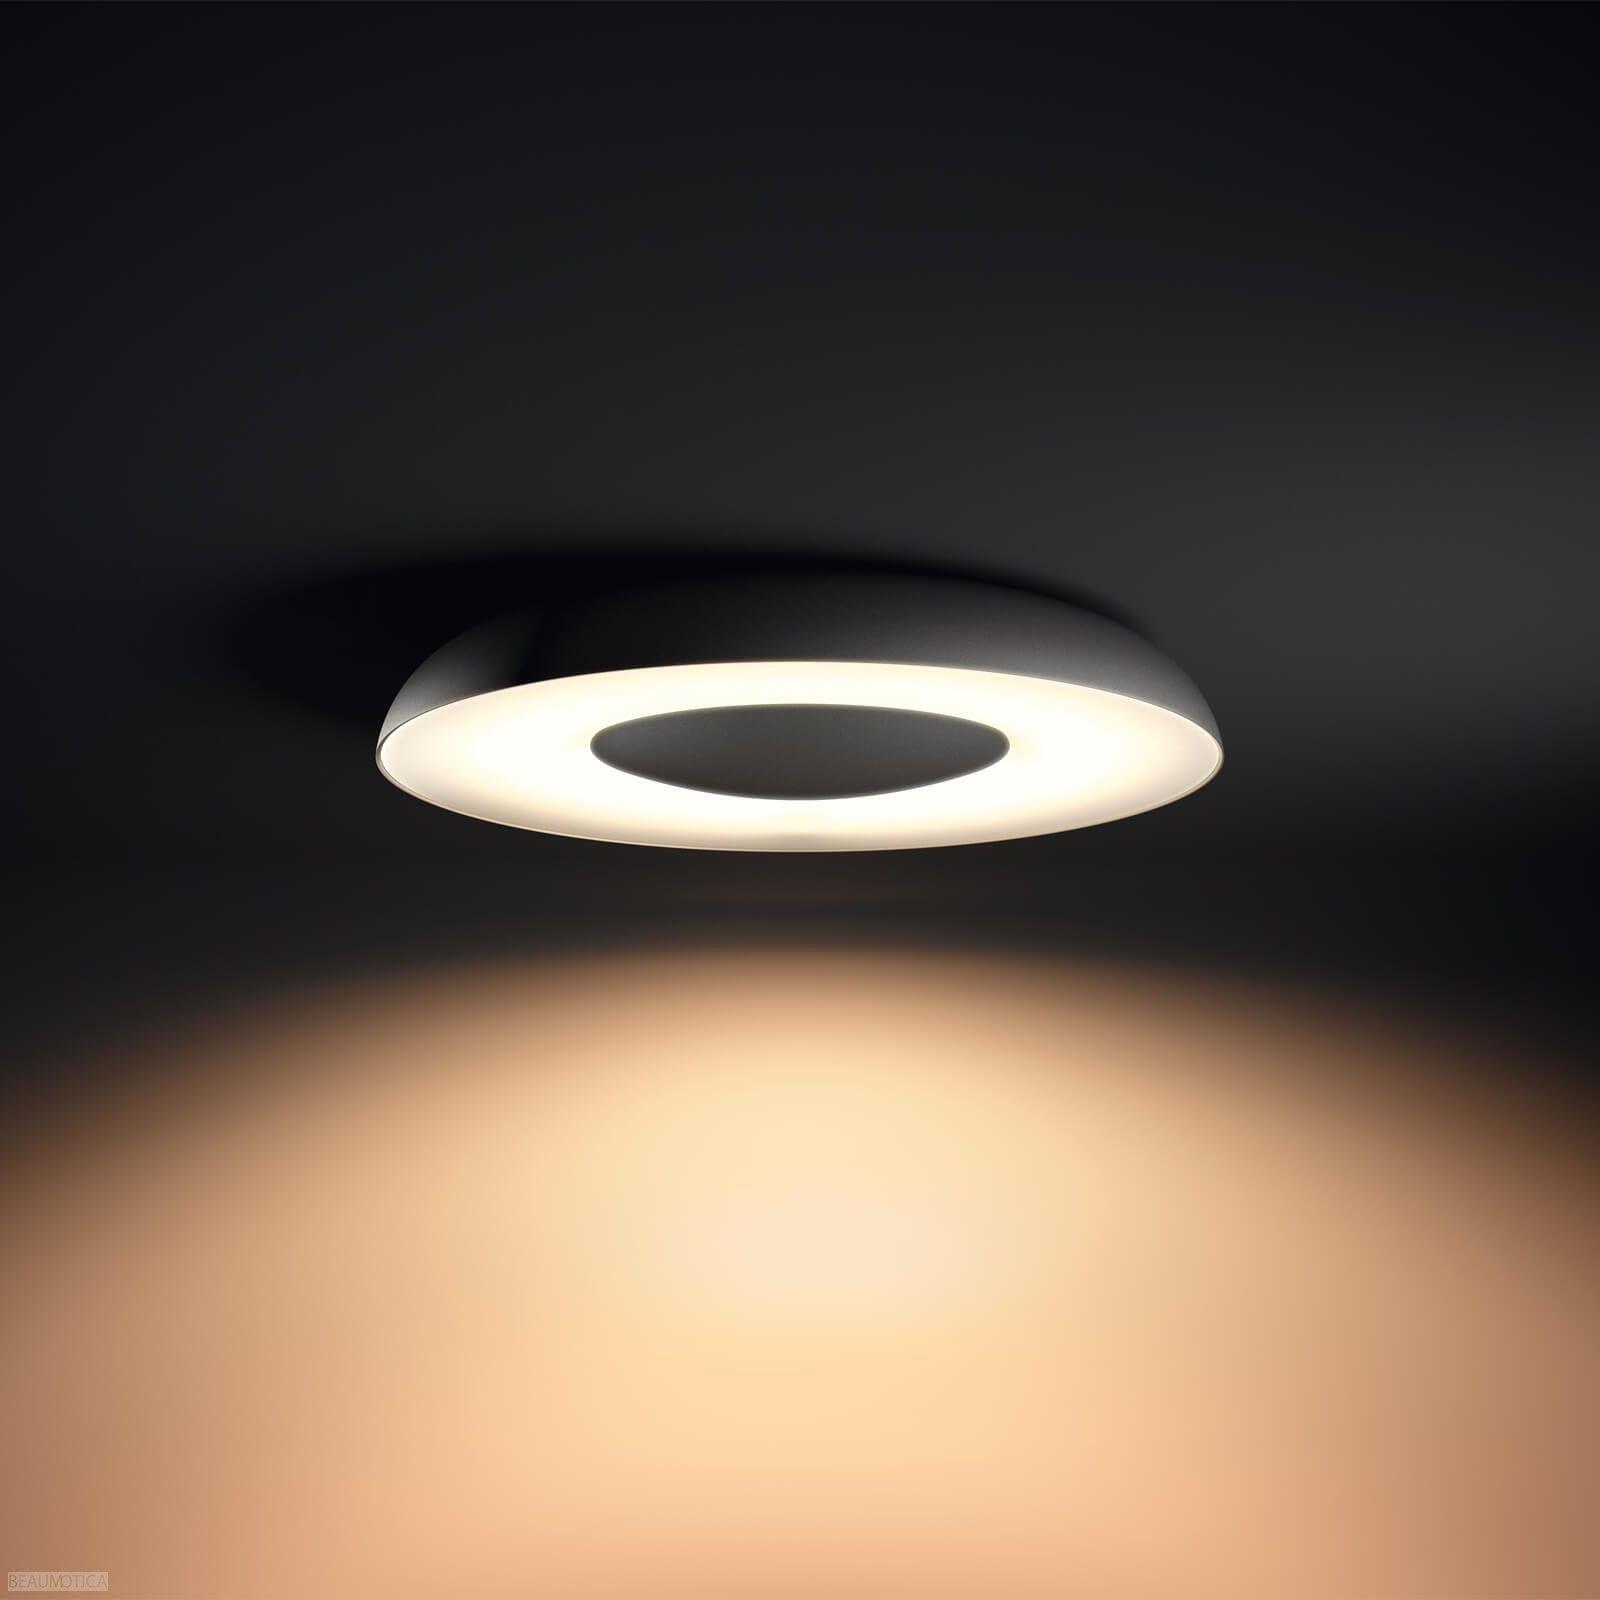 Philips Hue Still Plafondlamp Zwart White Ambiance Incl Dim Switch In 2020 Hue Ceiling Pendant Pendant Lighting